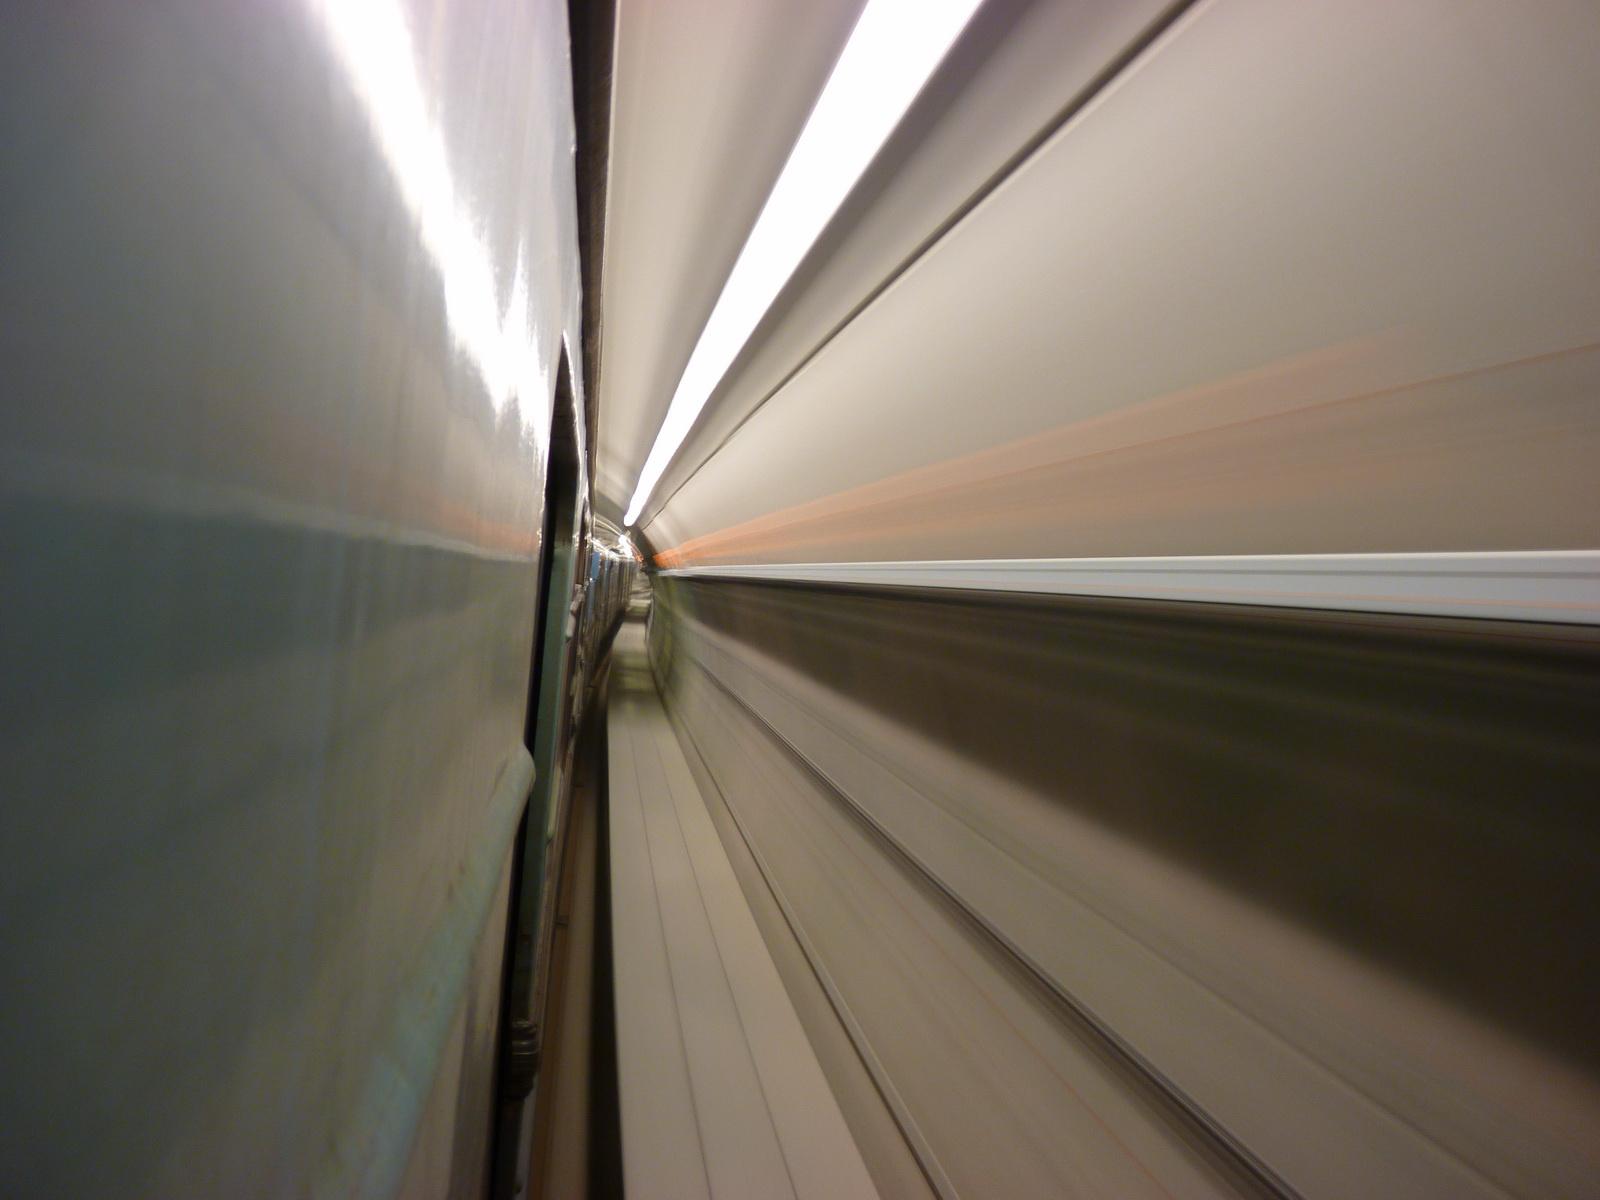 LoviGabi: M4 tesztfutas Ev3 20121128-20